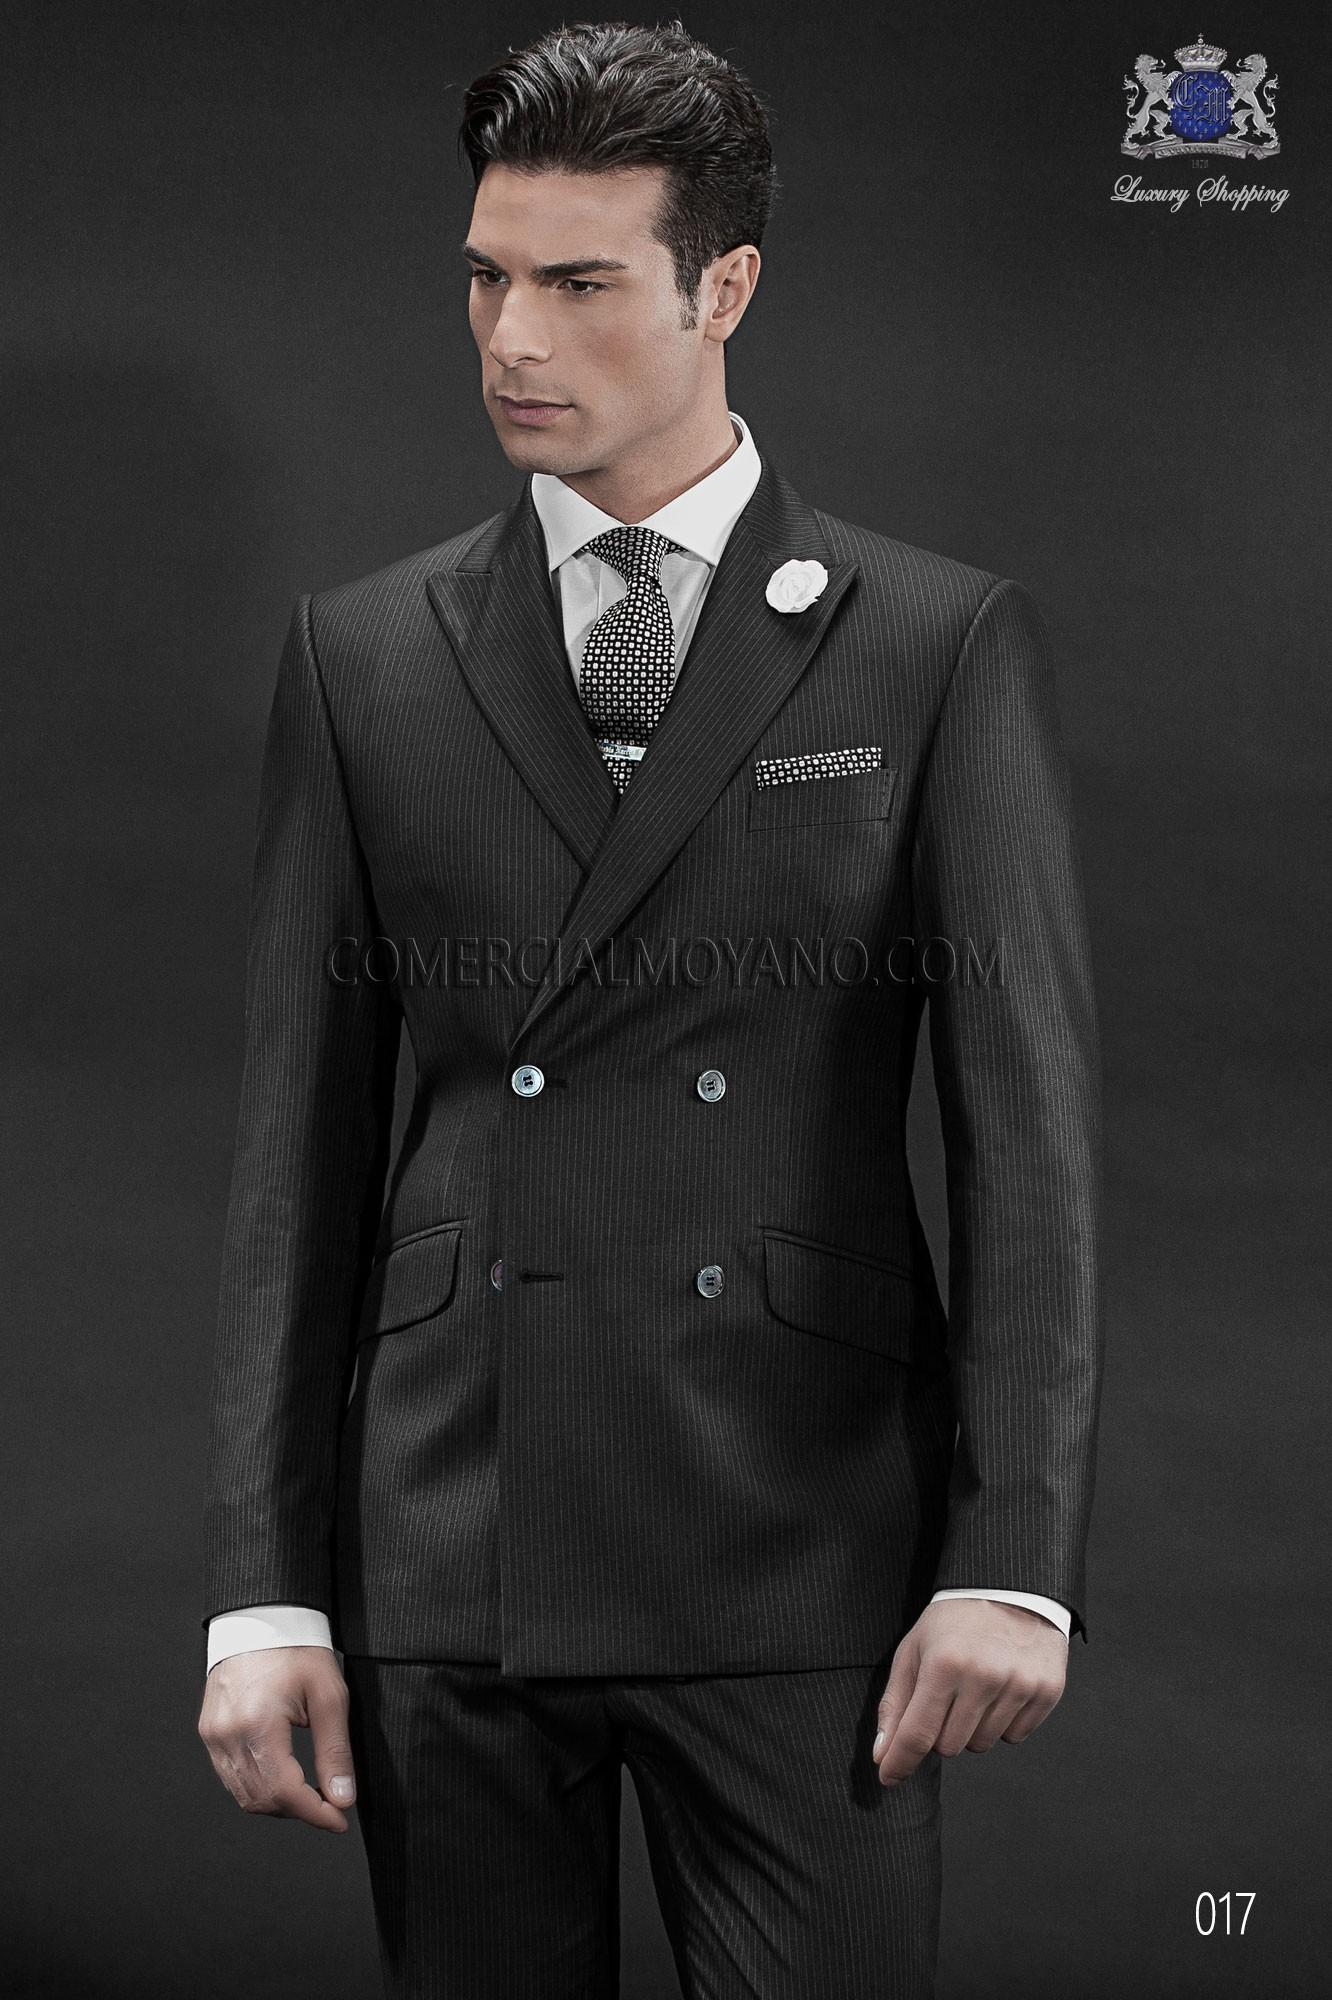 Gentleman black men wedding suit model 017 Ottavio Nuccio Gala